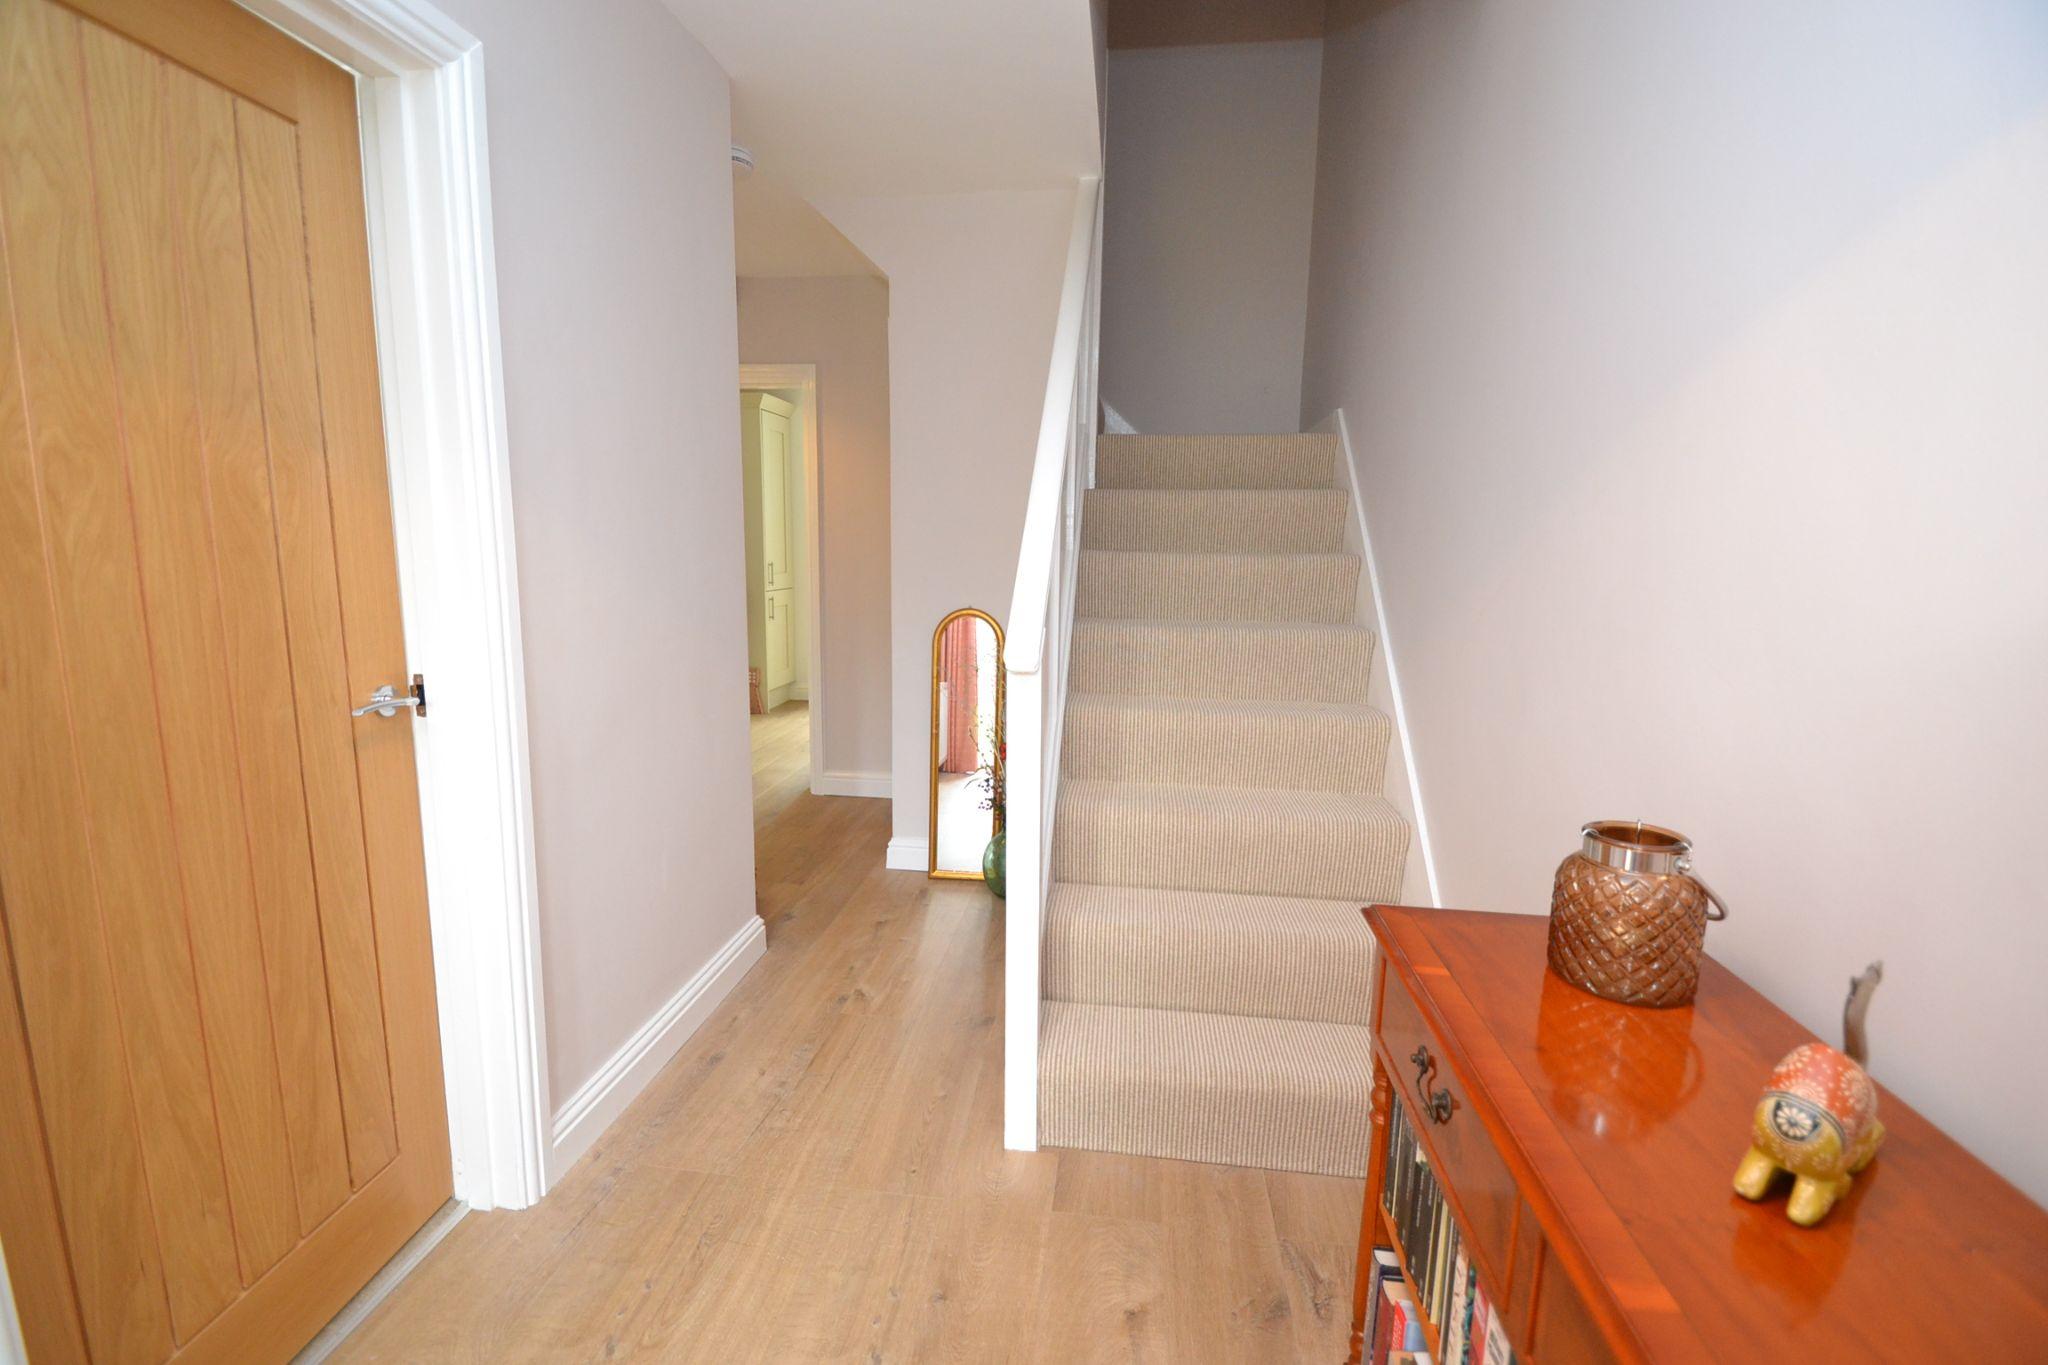 2 Bedroom Semi-detached Dormer House For Sale - Photograph 6